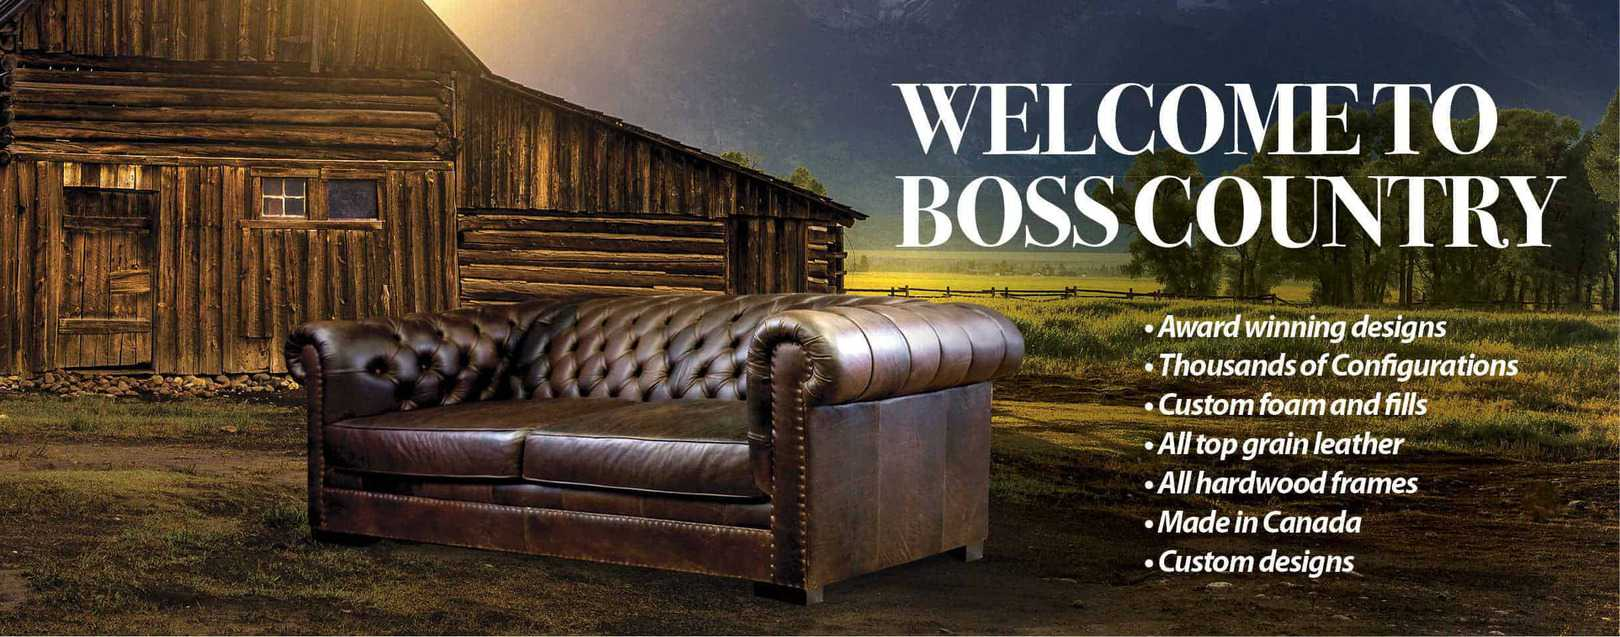 BossSlide_BossCountry-1